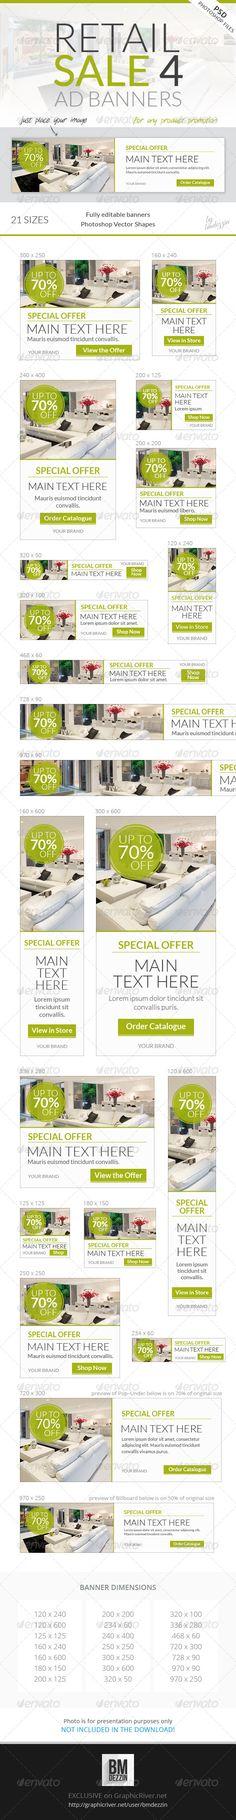 pc printable laser price tags 7 x 11 sale pet store design